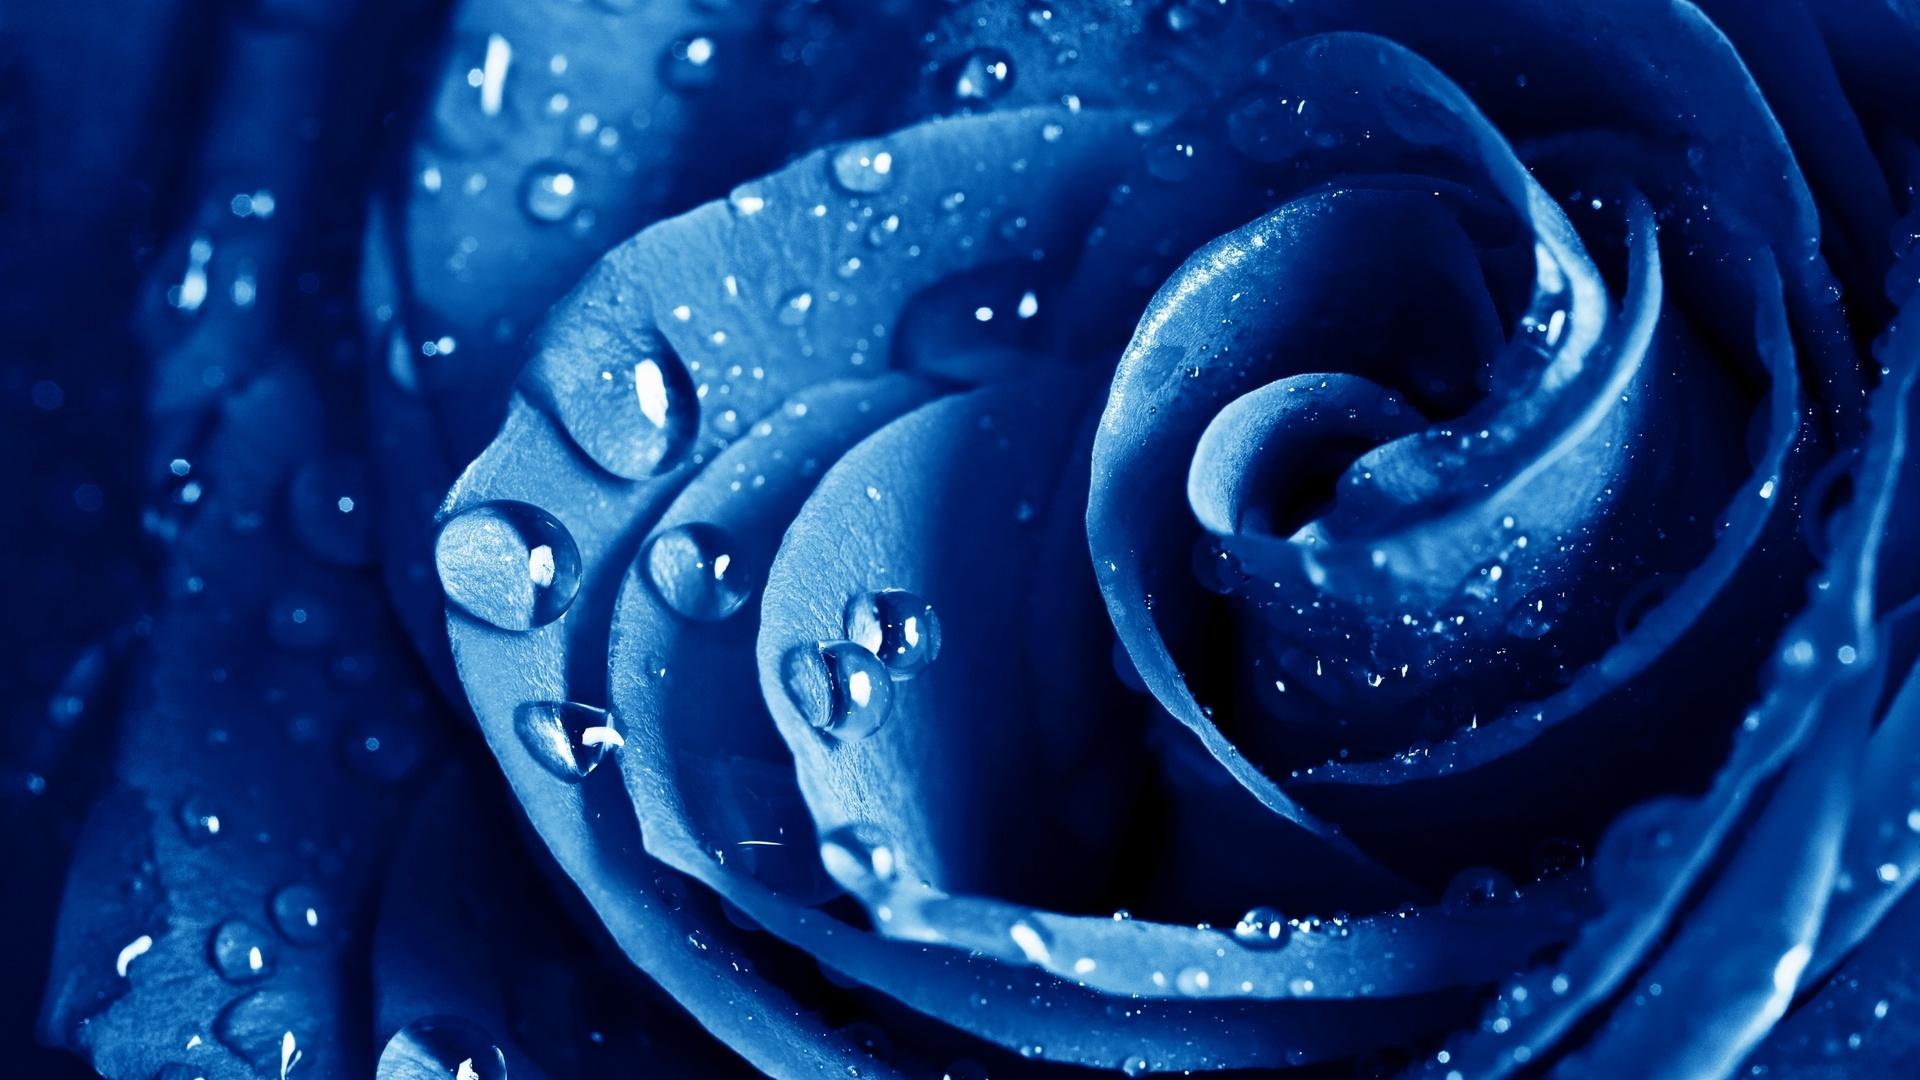 HD Fonds dcran macro rose bleu La rose bleue des fleurs photo 1920x1080